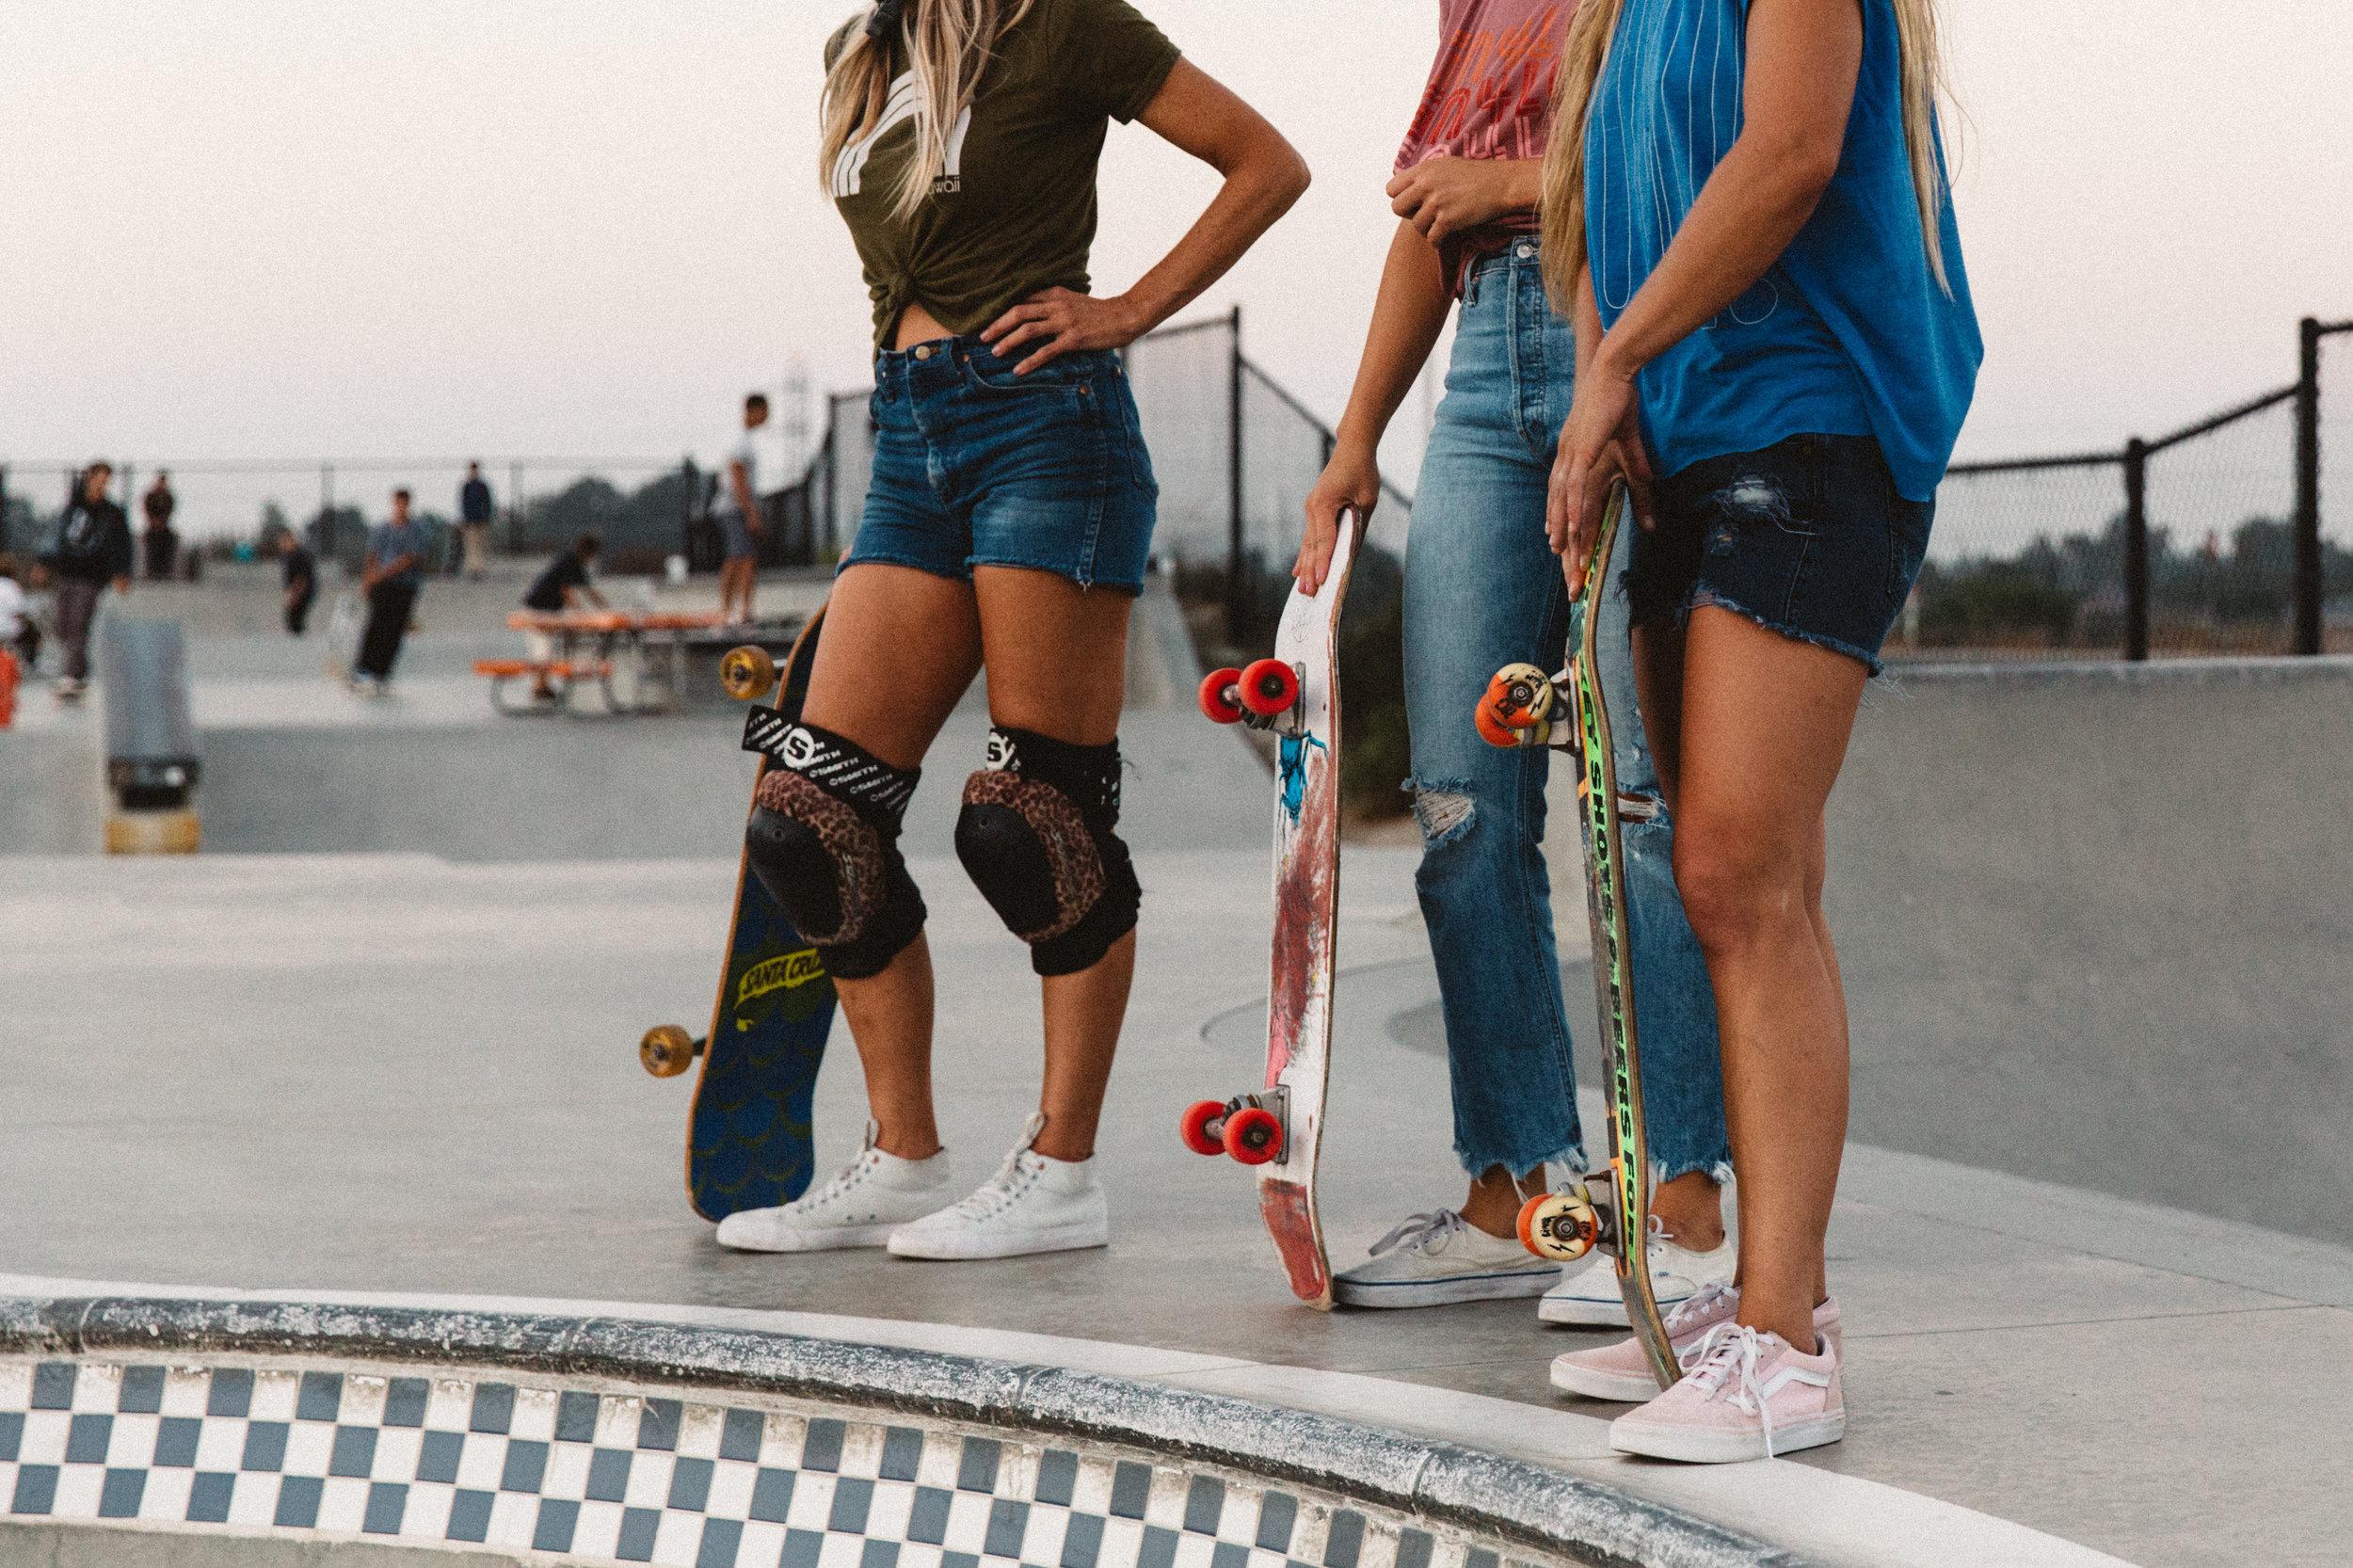 SkaterBabes-1970.jpg